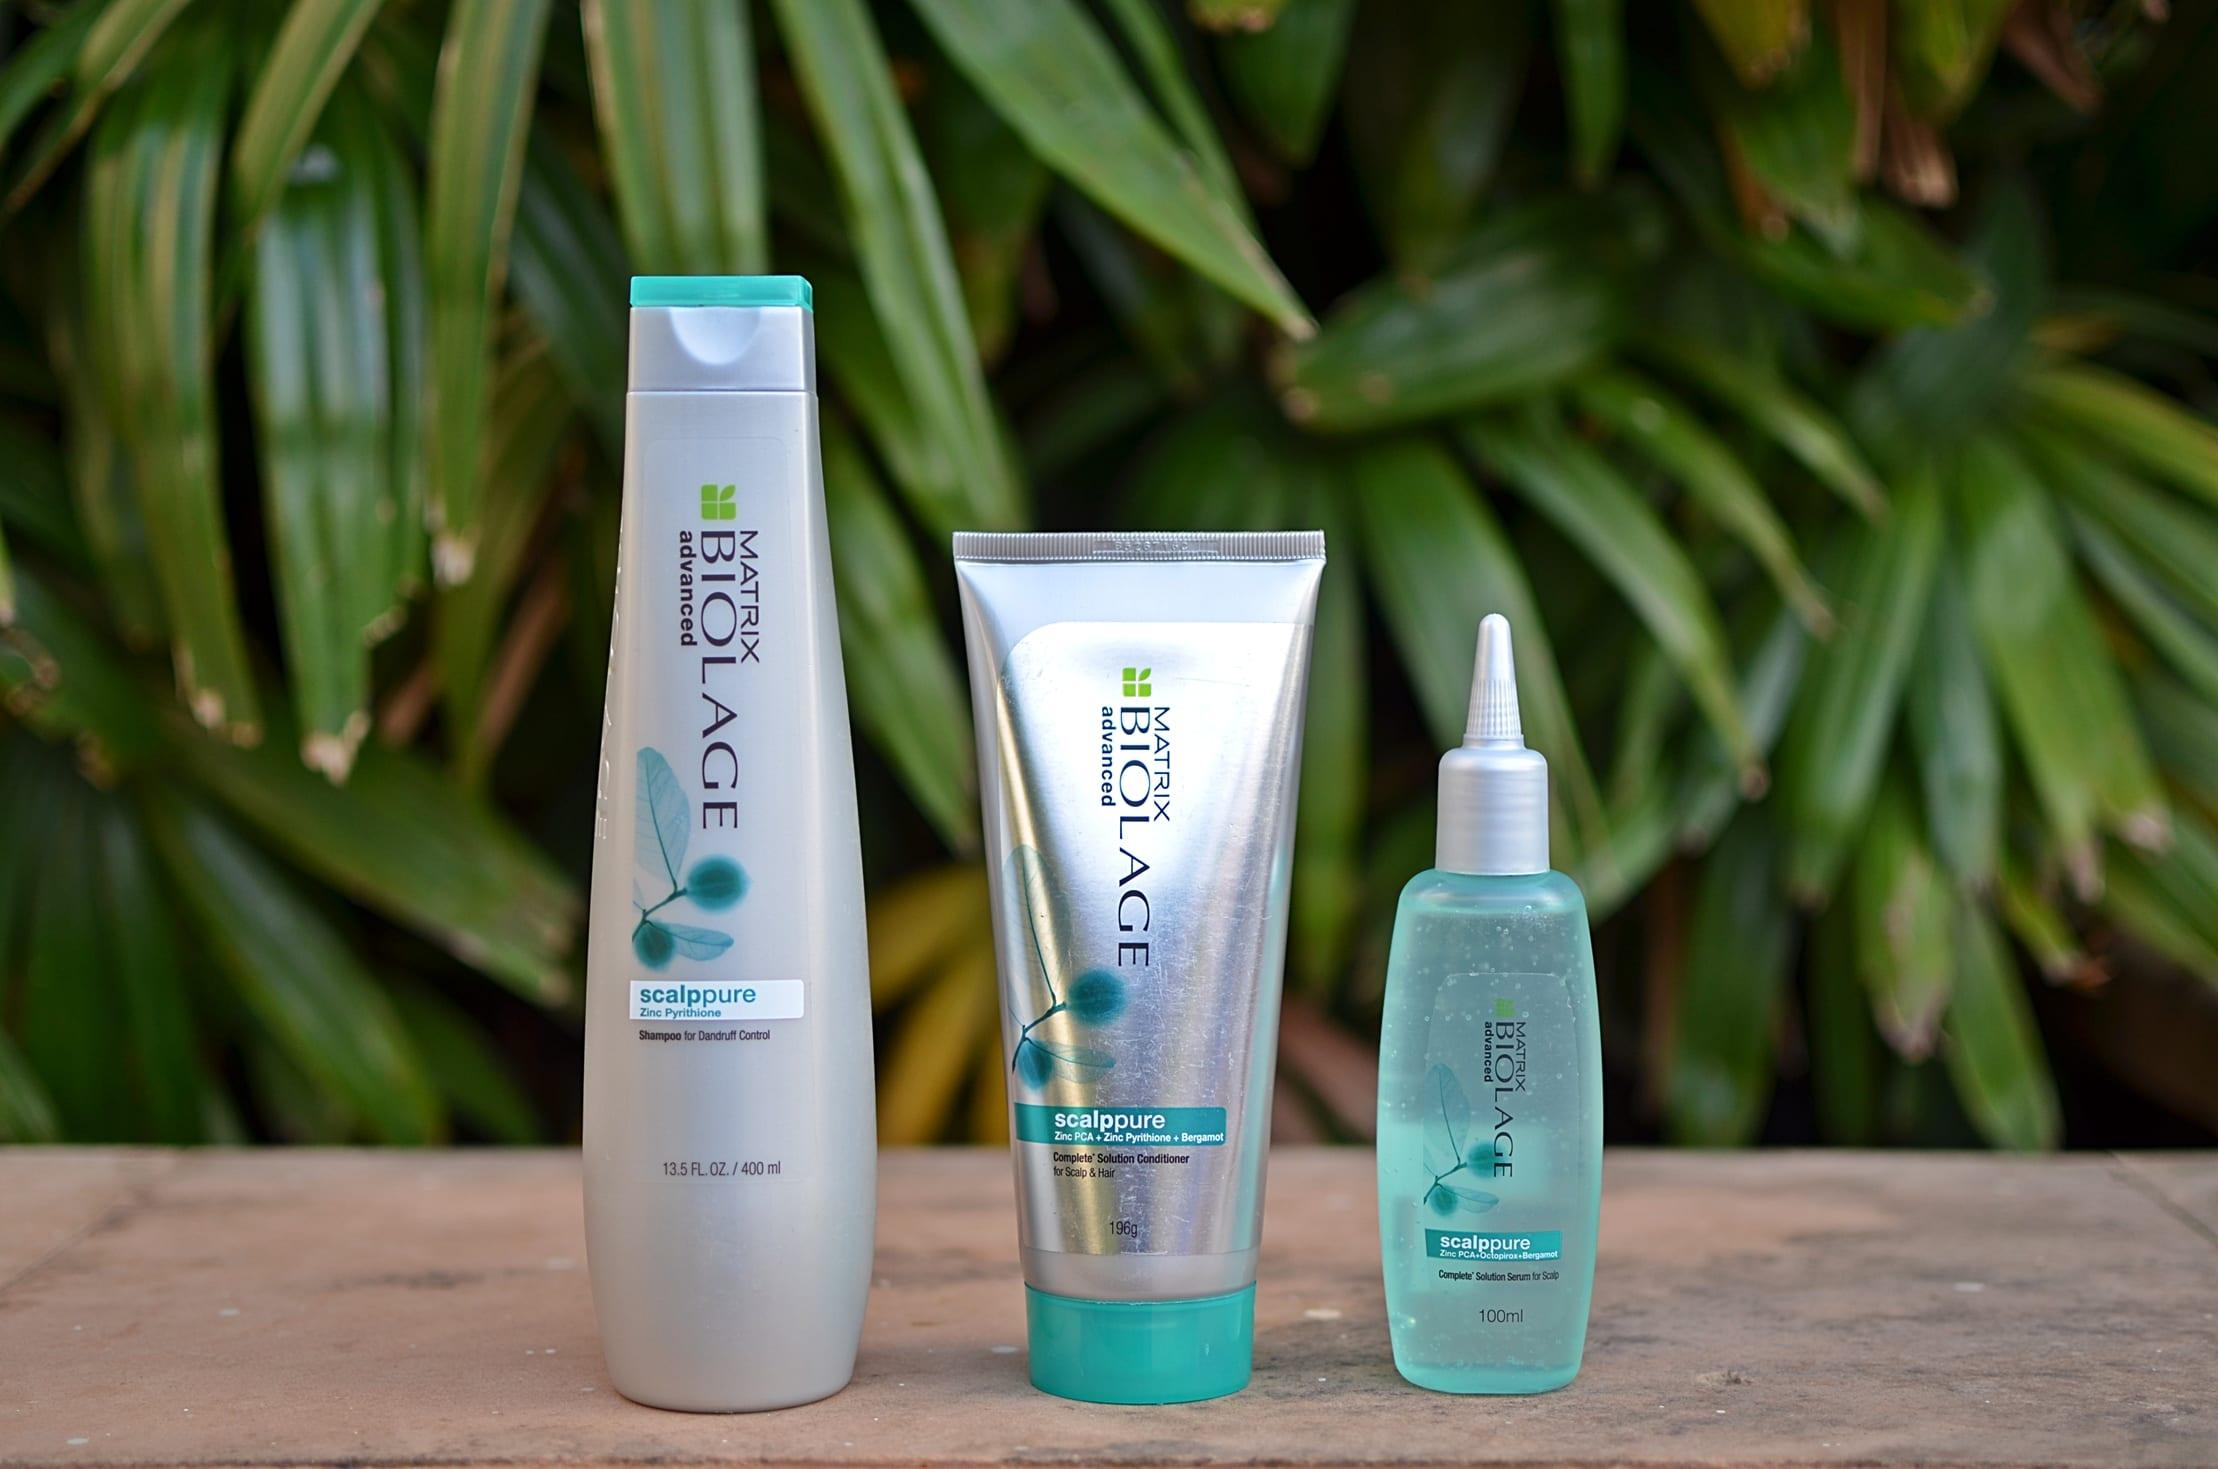 matrix-biolage-scalp-pure-shampoo-conditioner-1